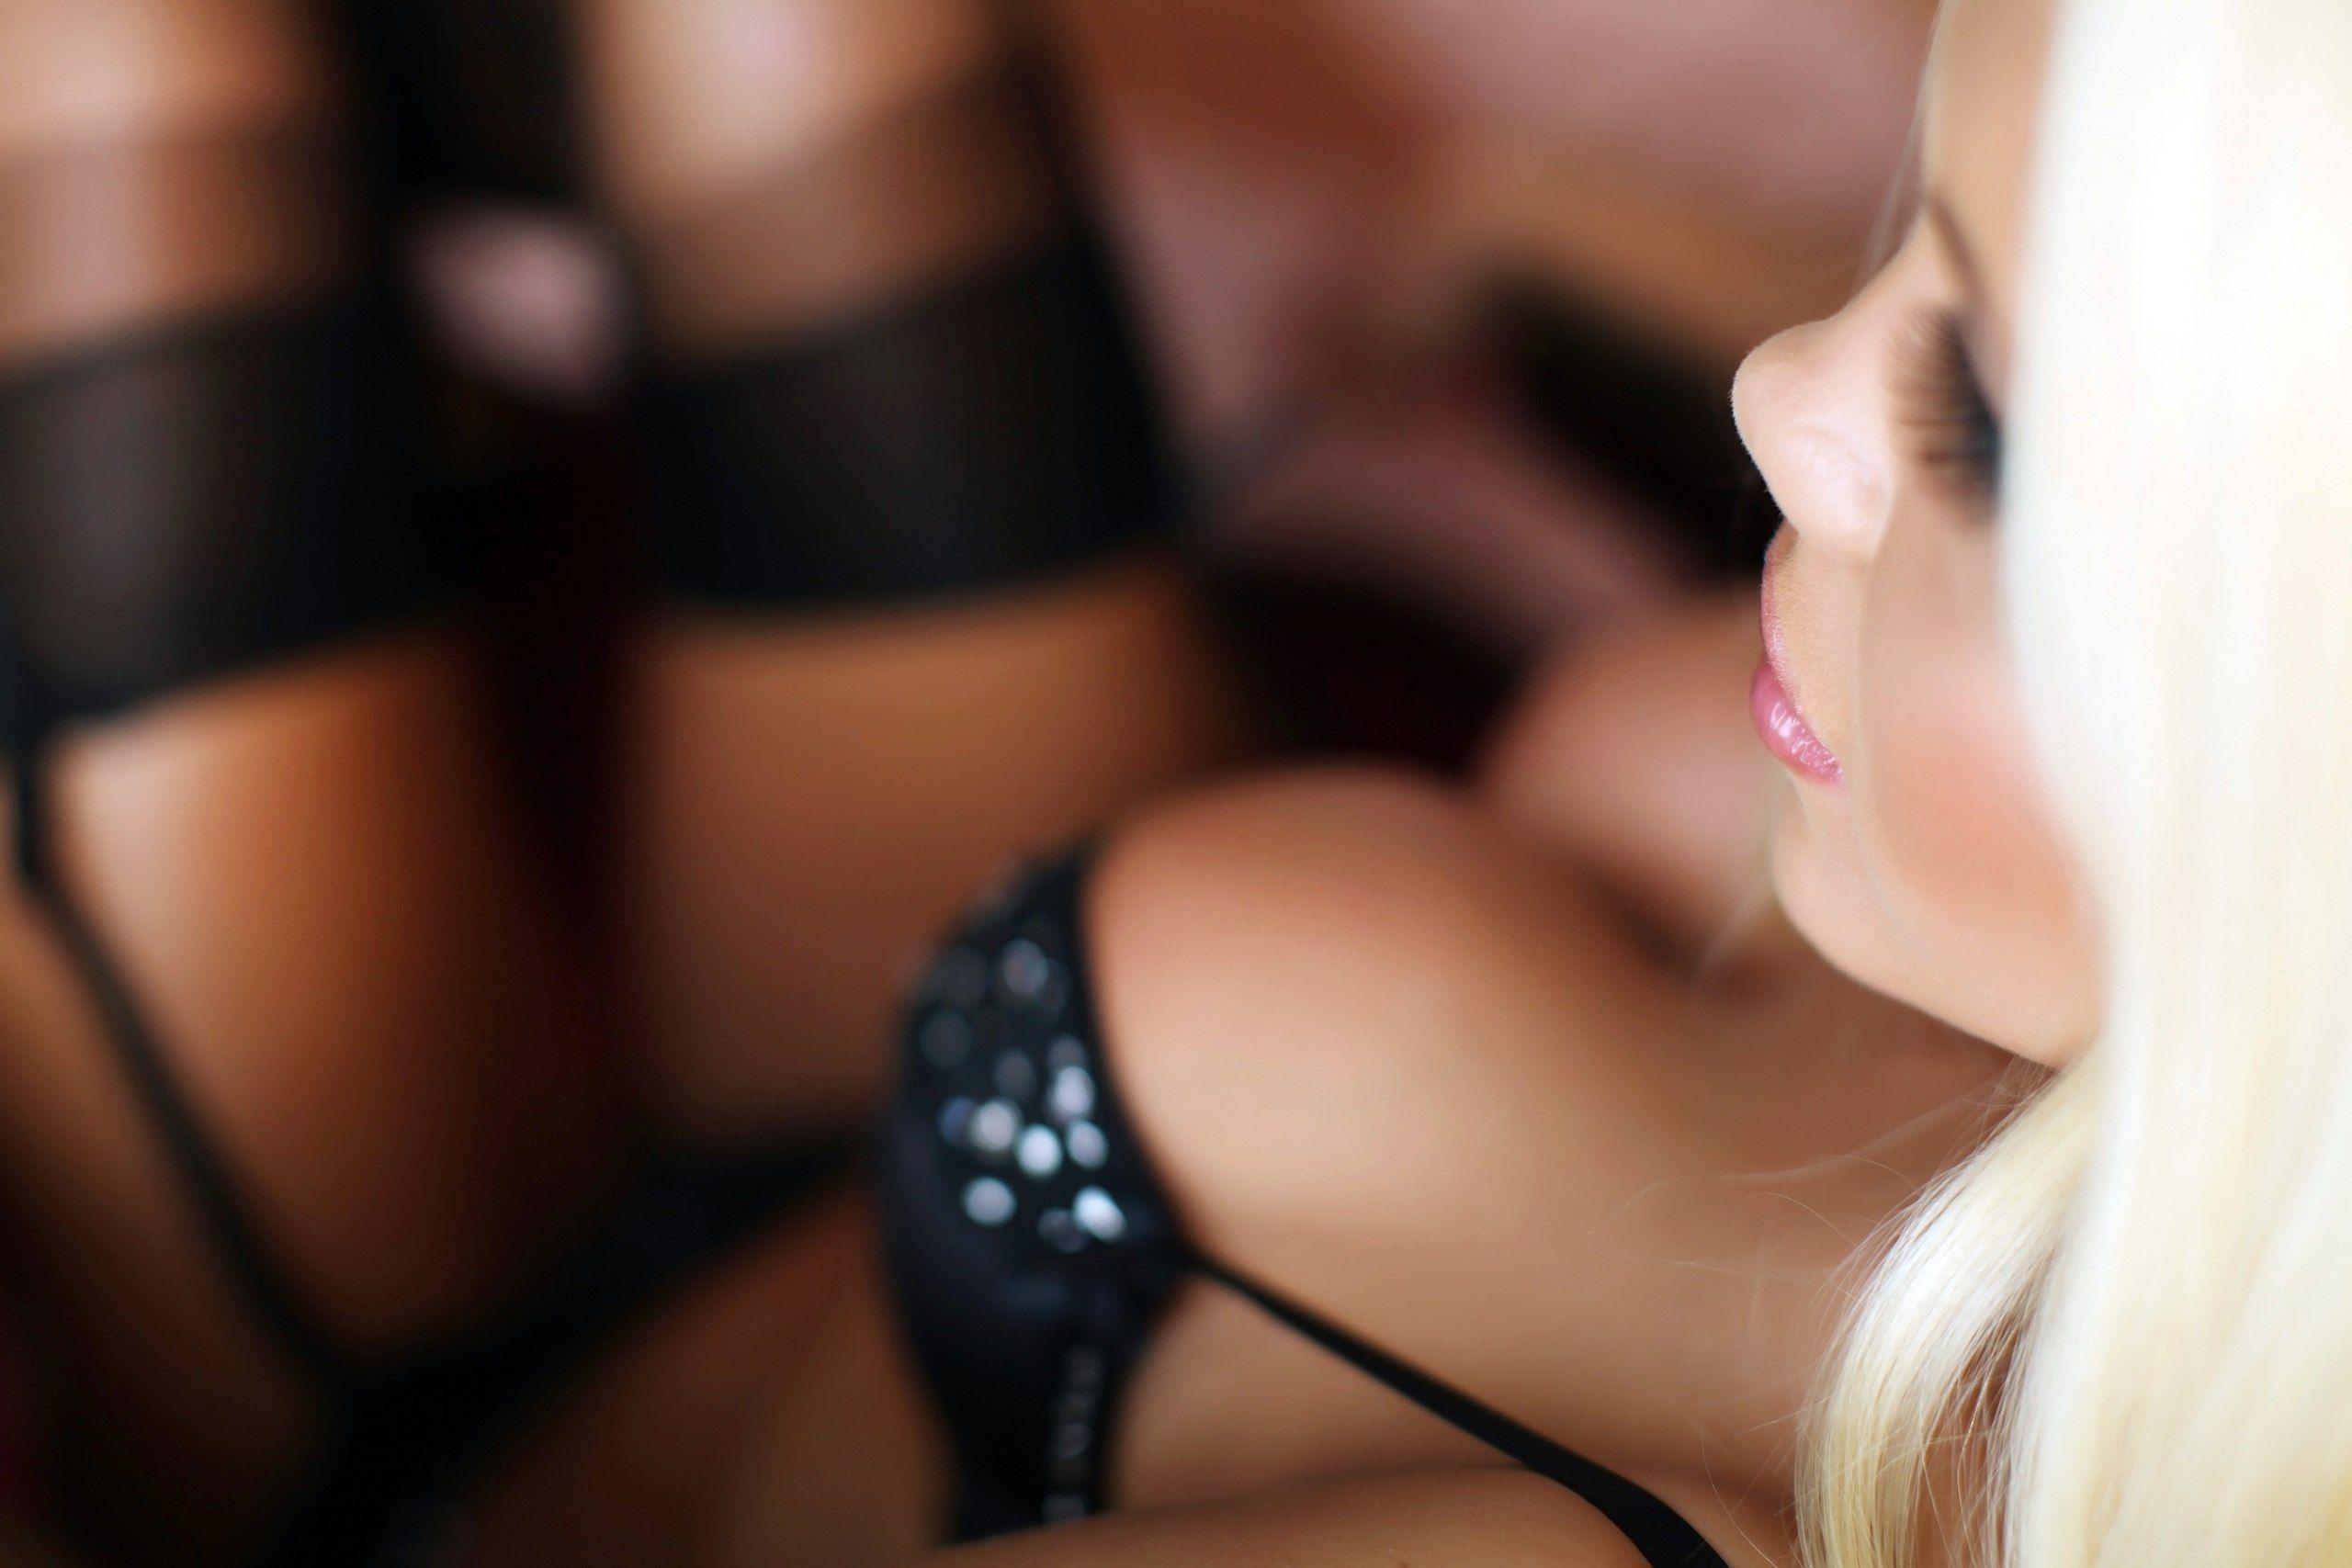 Porno Aja Jane nudes (22 photos), Ass, Cleavage, Twitter, legs 2017